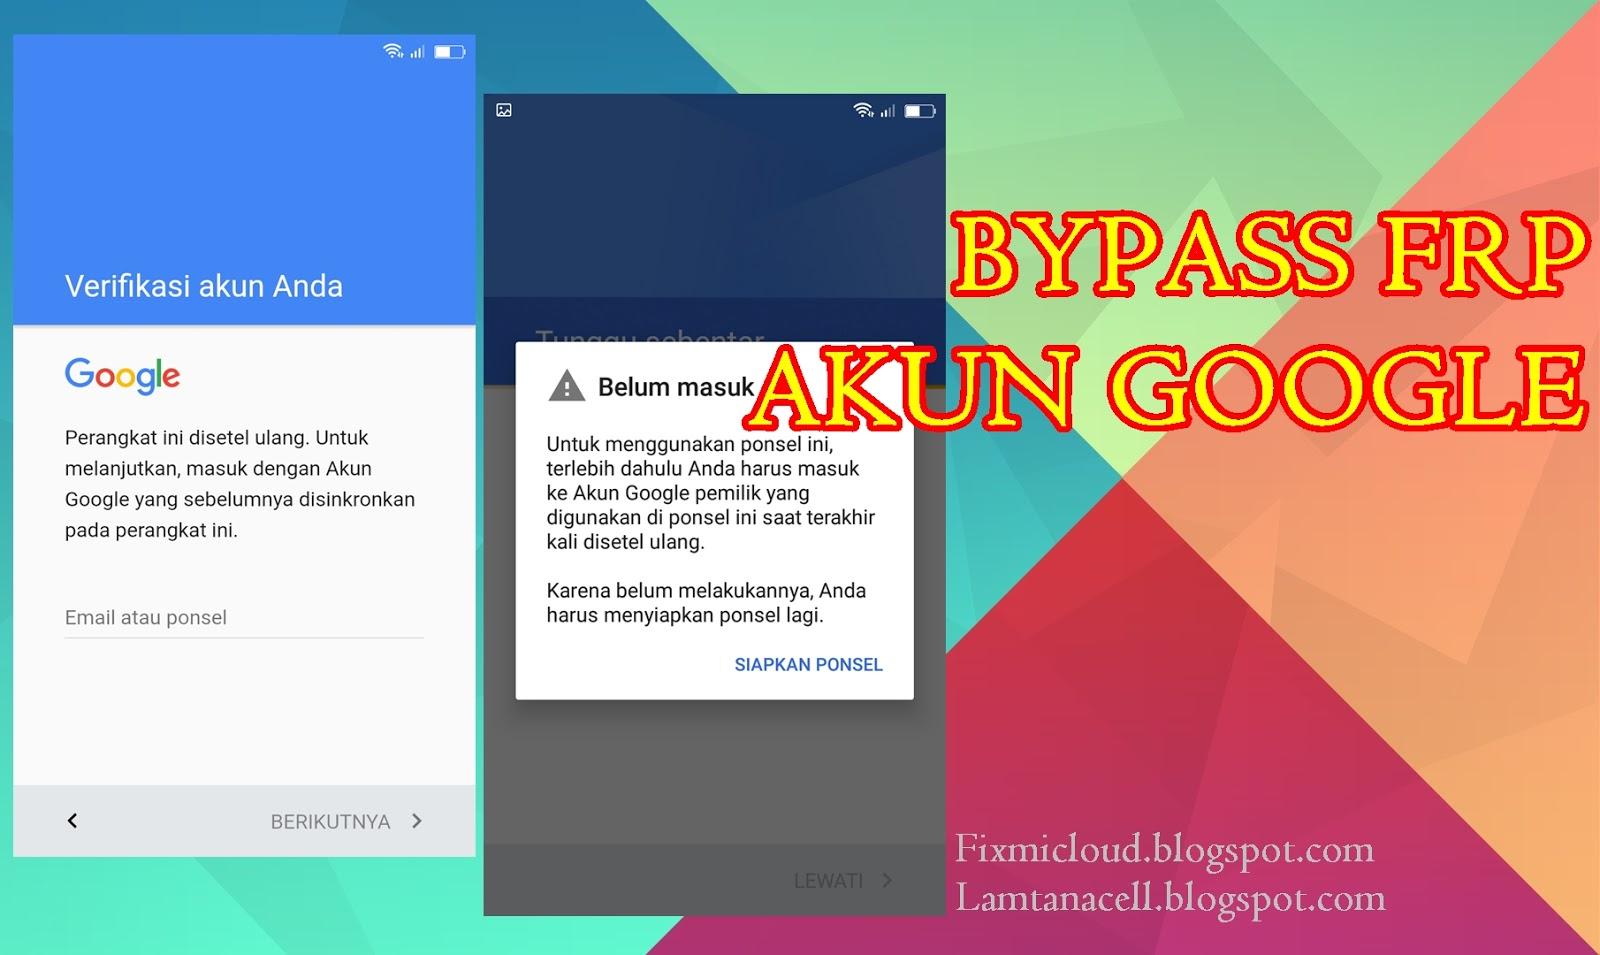 Cara Bypass FRP Lock Akun Google Pada Xiaomi Mi Max Prime (Helium